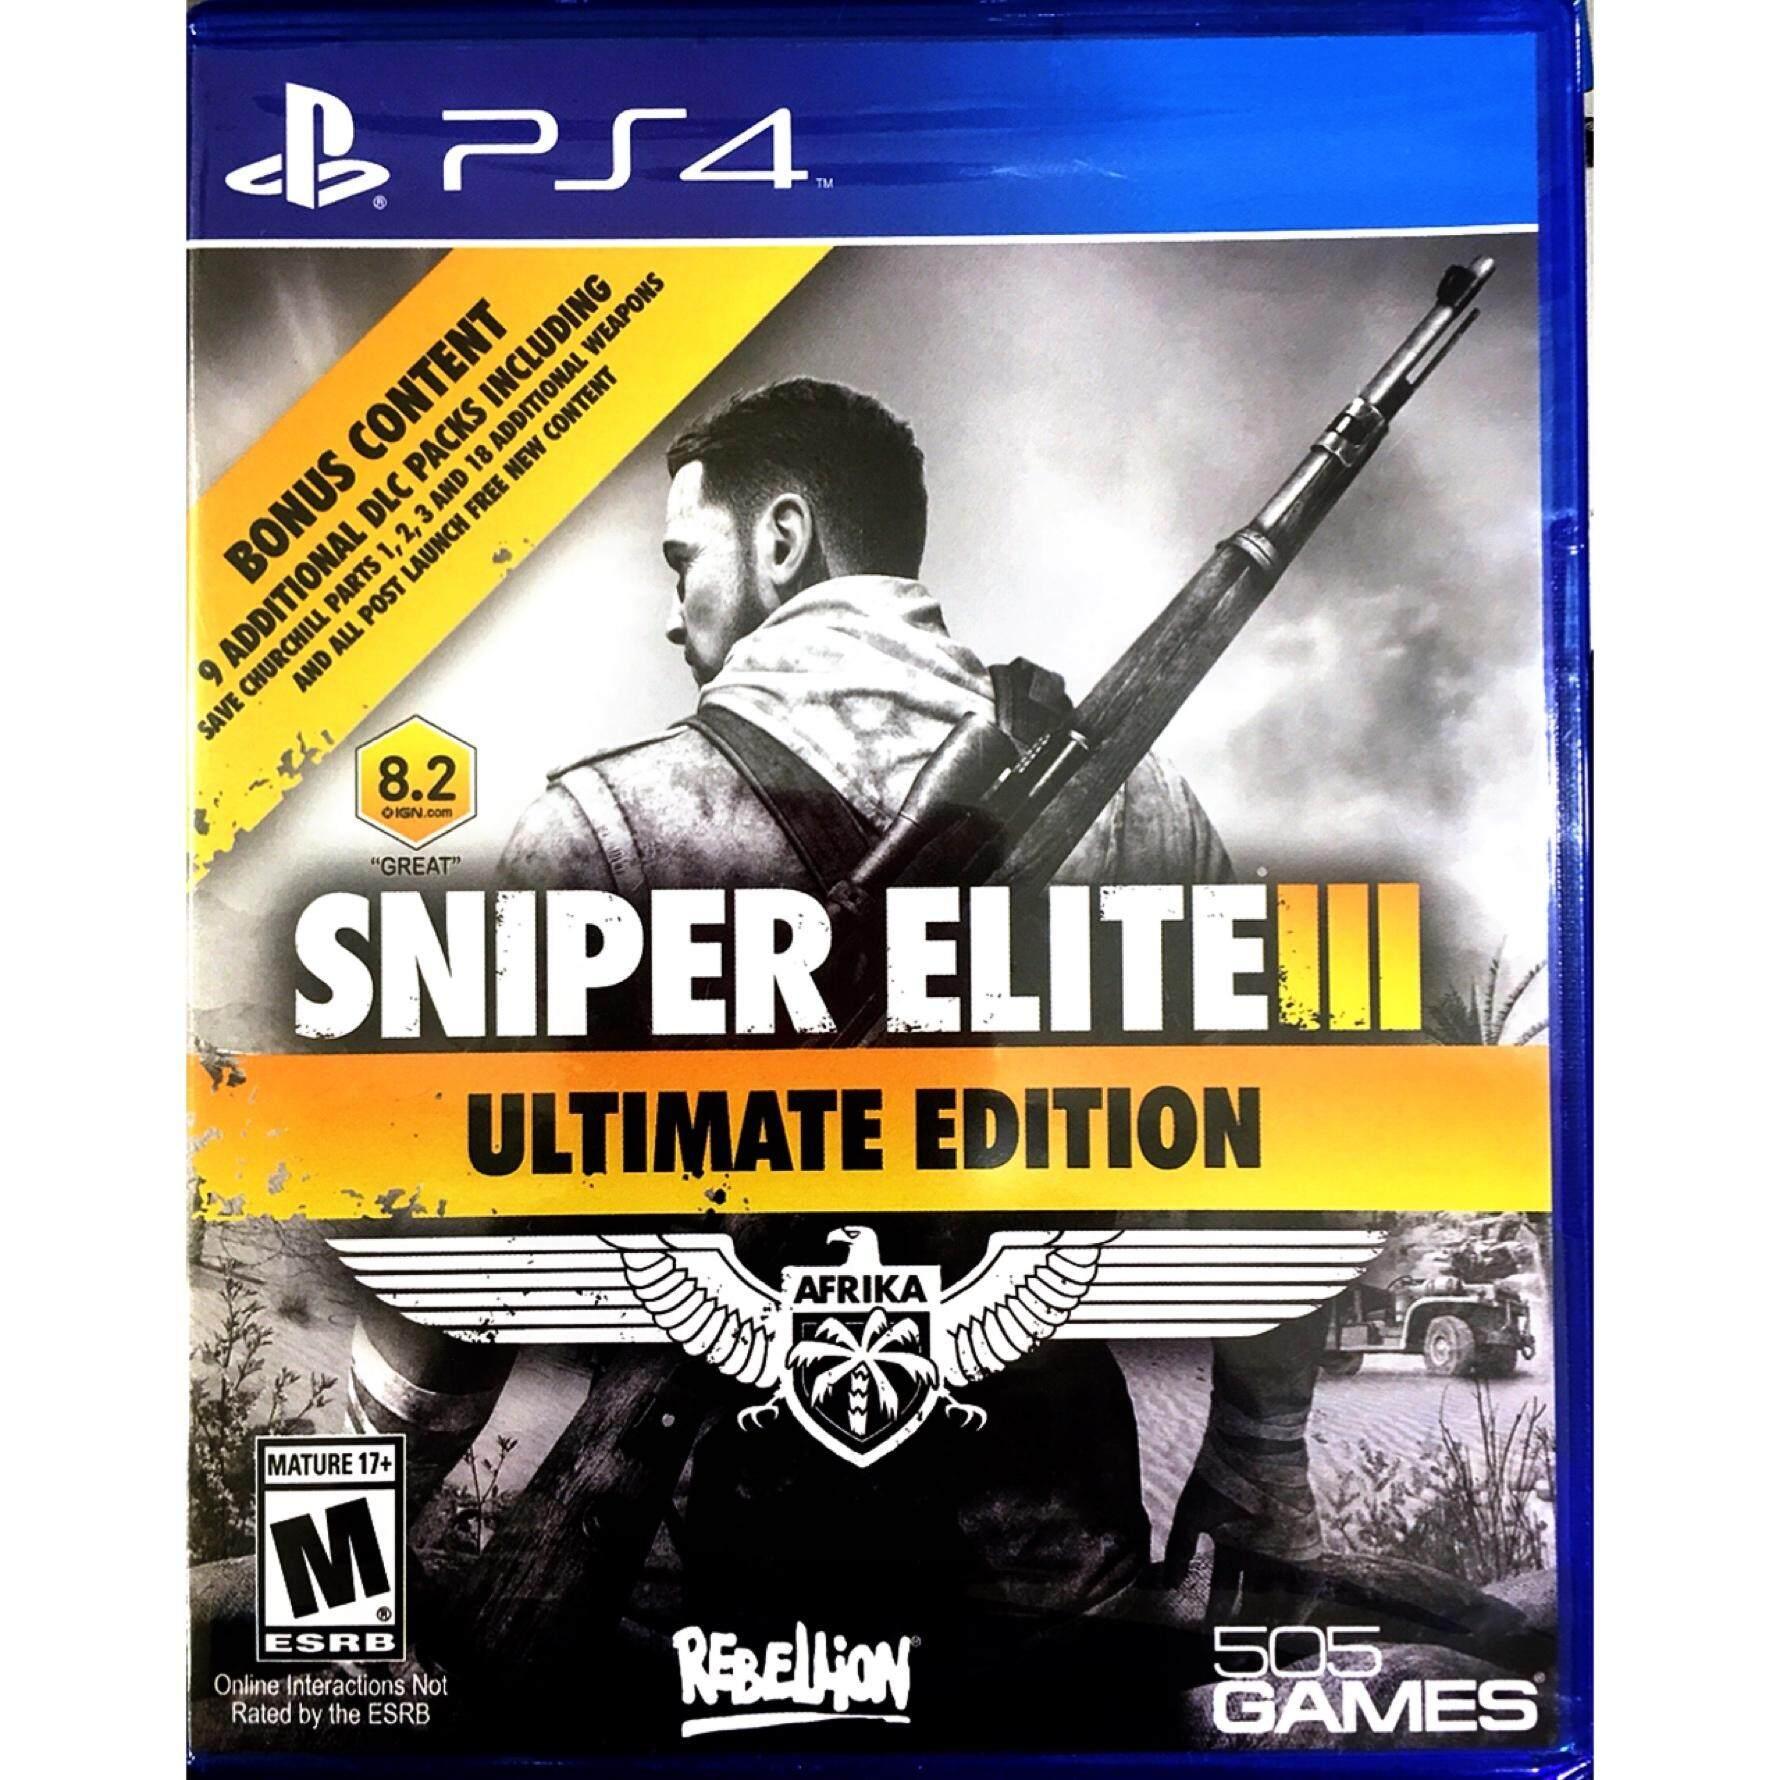 PS4 Sniper Elite III Ultimate Edition ( AllZone )( English )